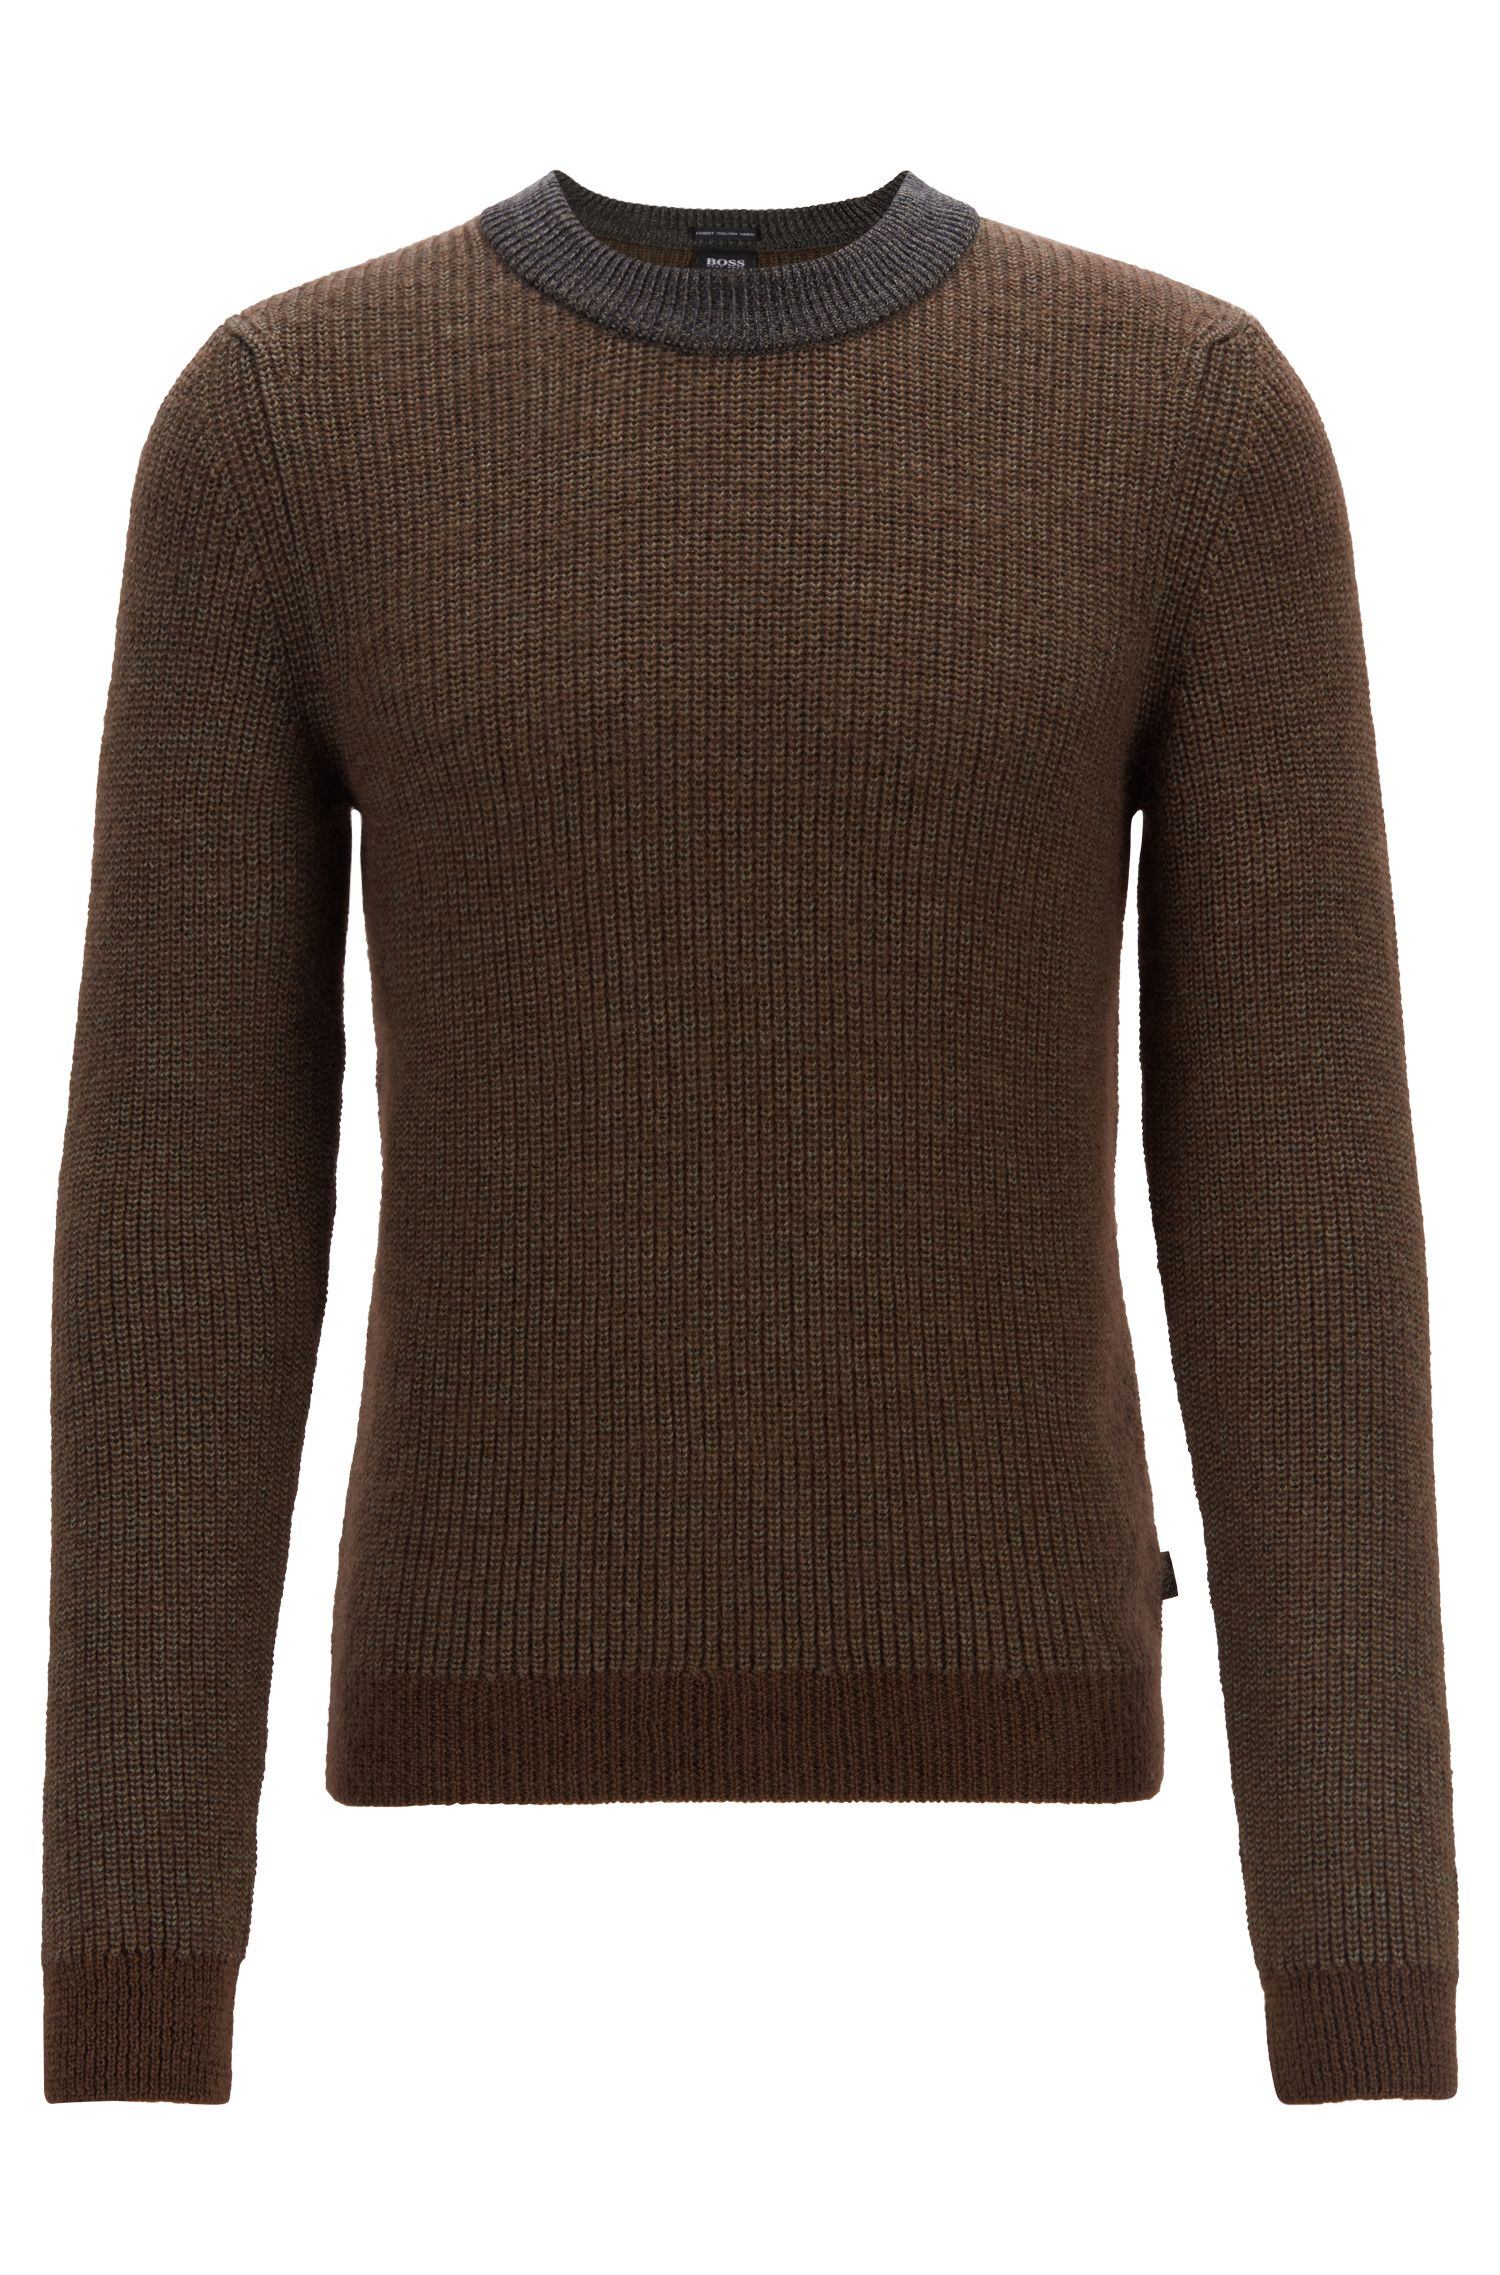 Jersey de cuello redondo en mezcla de lana virgen con textura, Gris claro